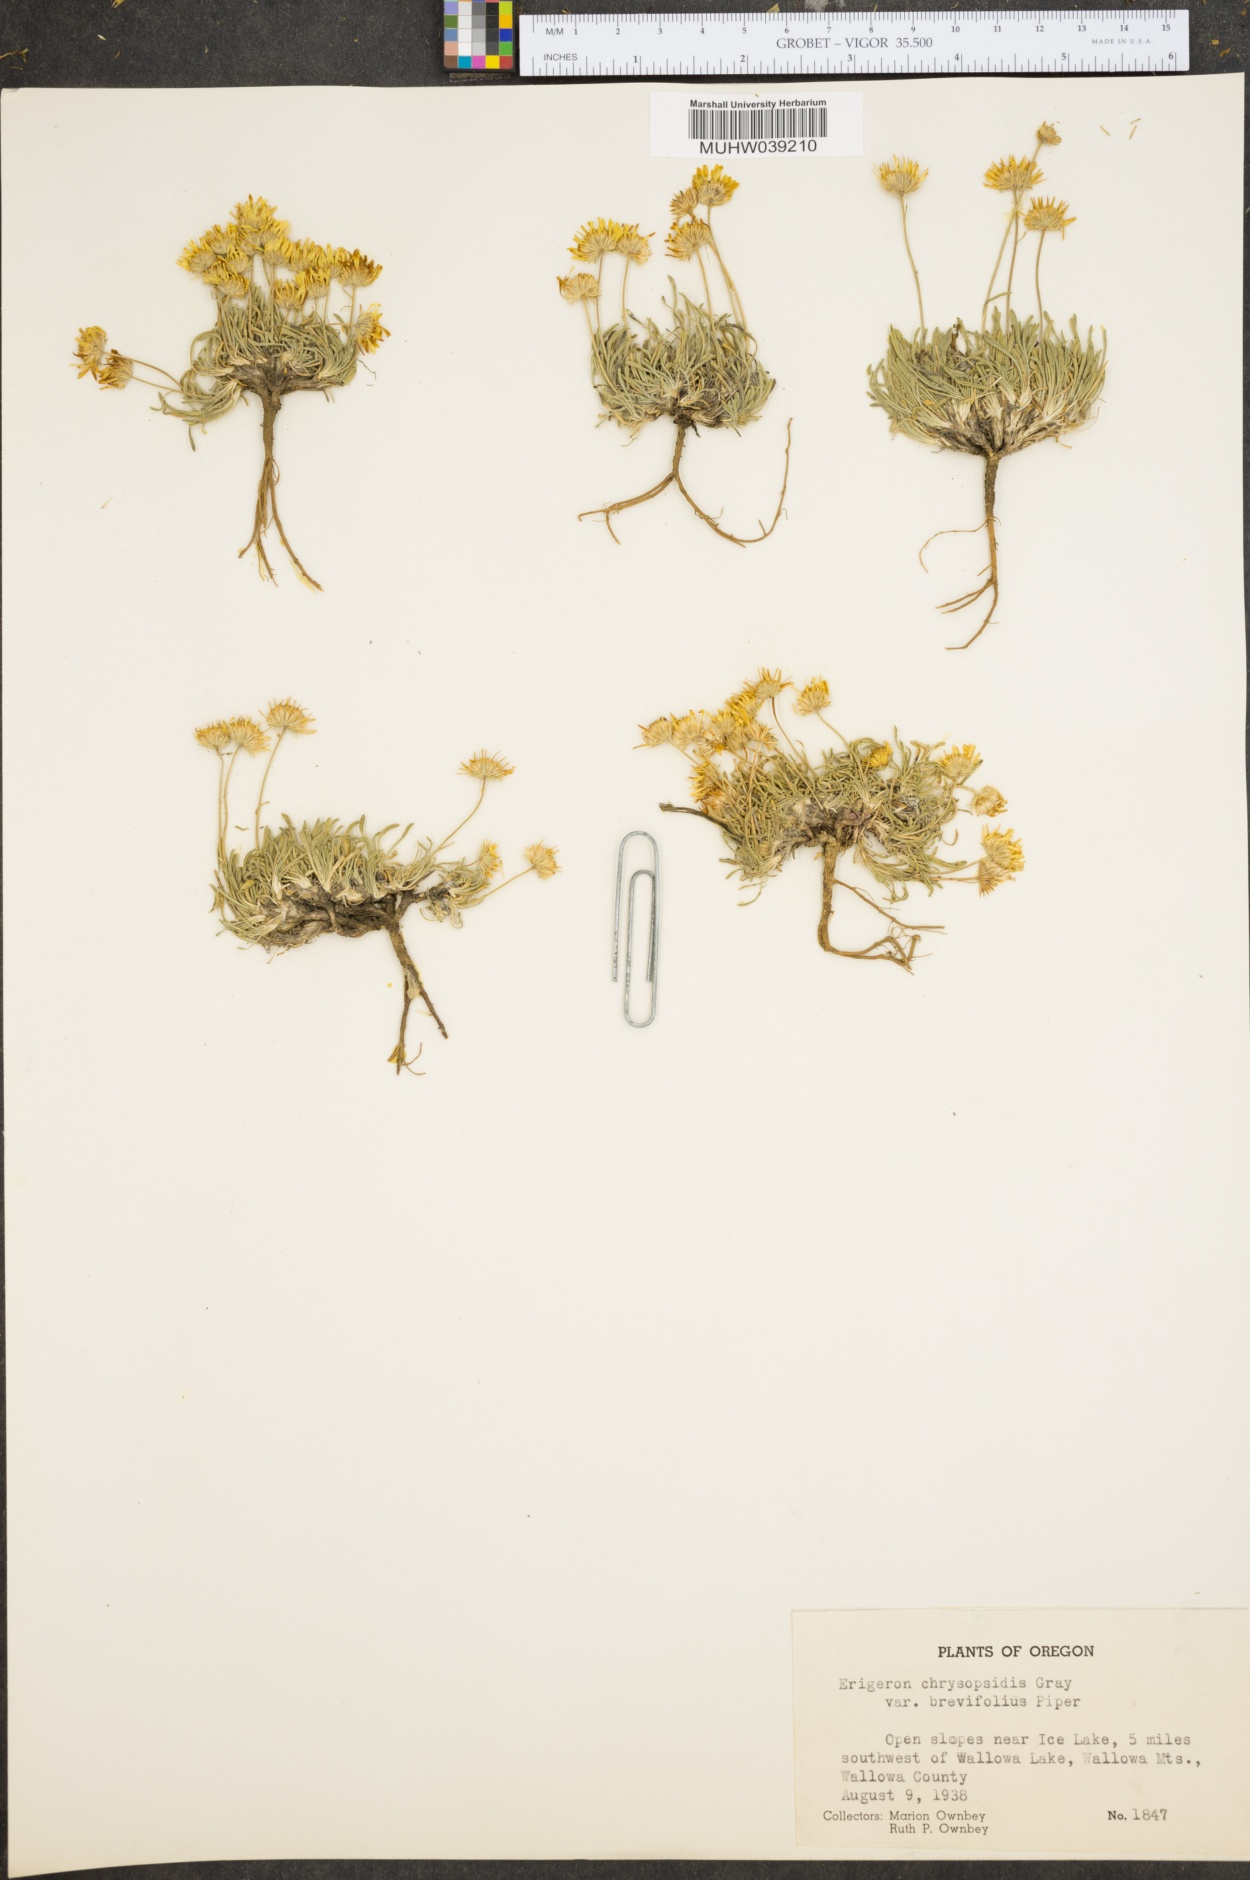 Erigeron chrysopsidis var. brevifolius image